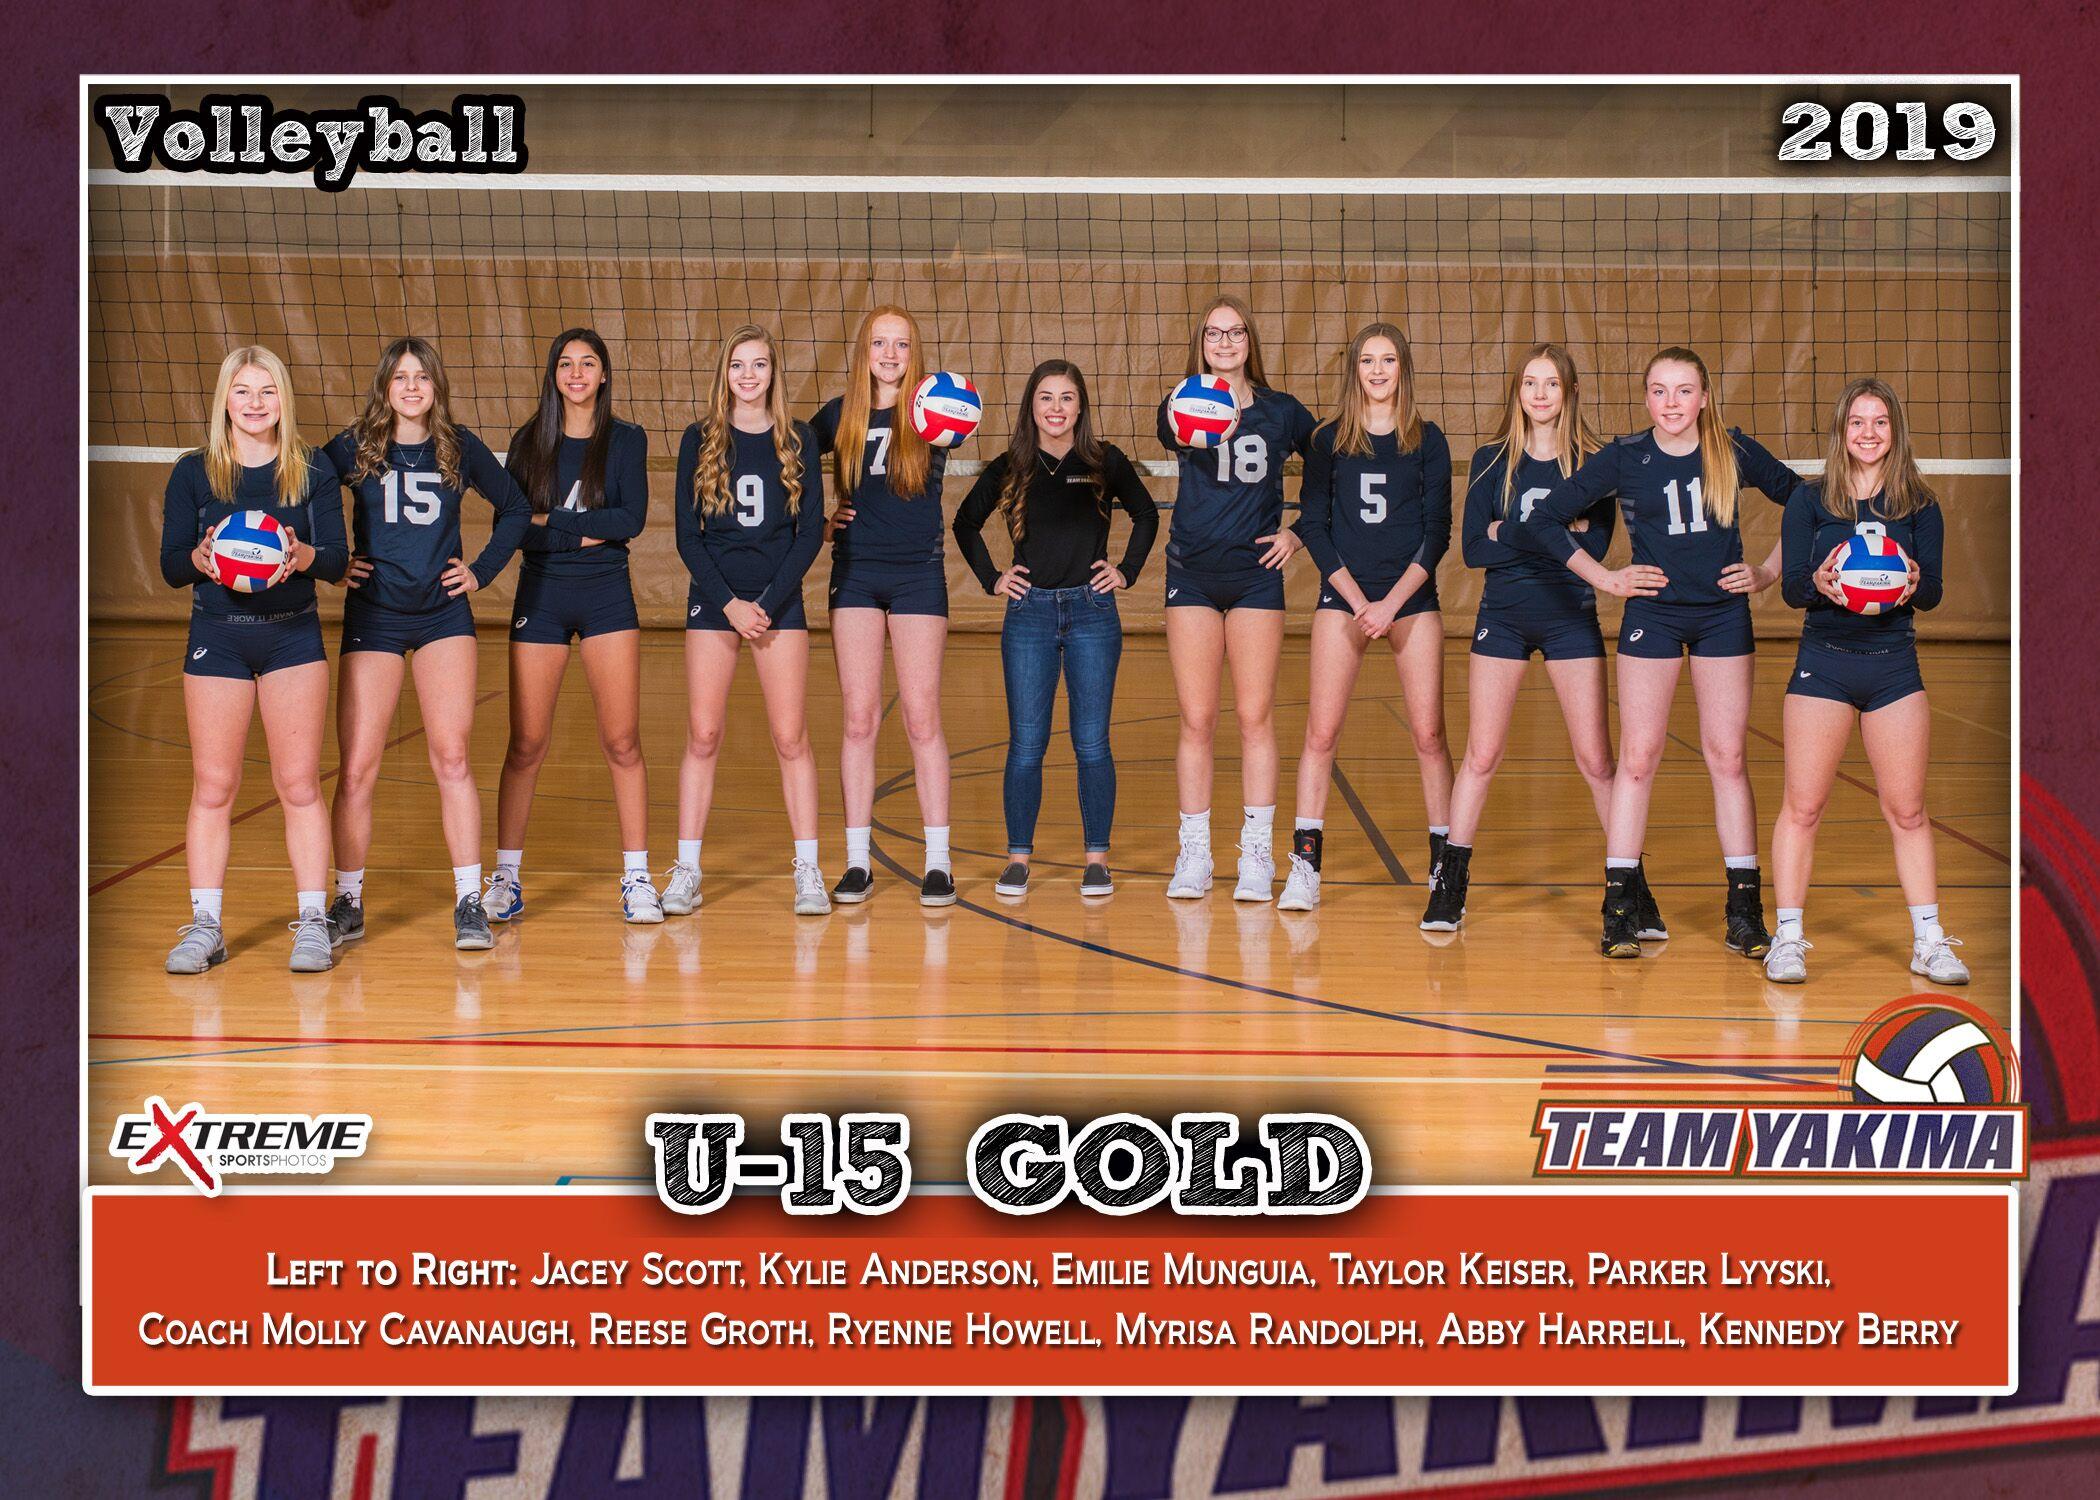 Team Yakima 15 Gold